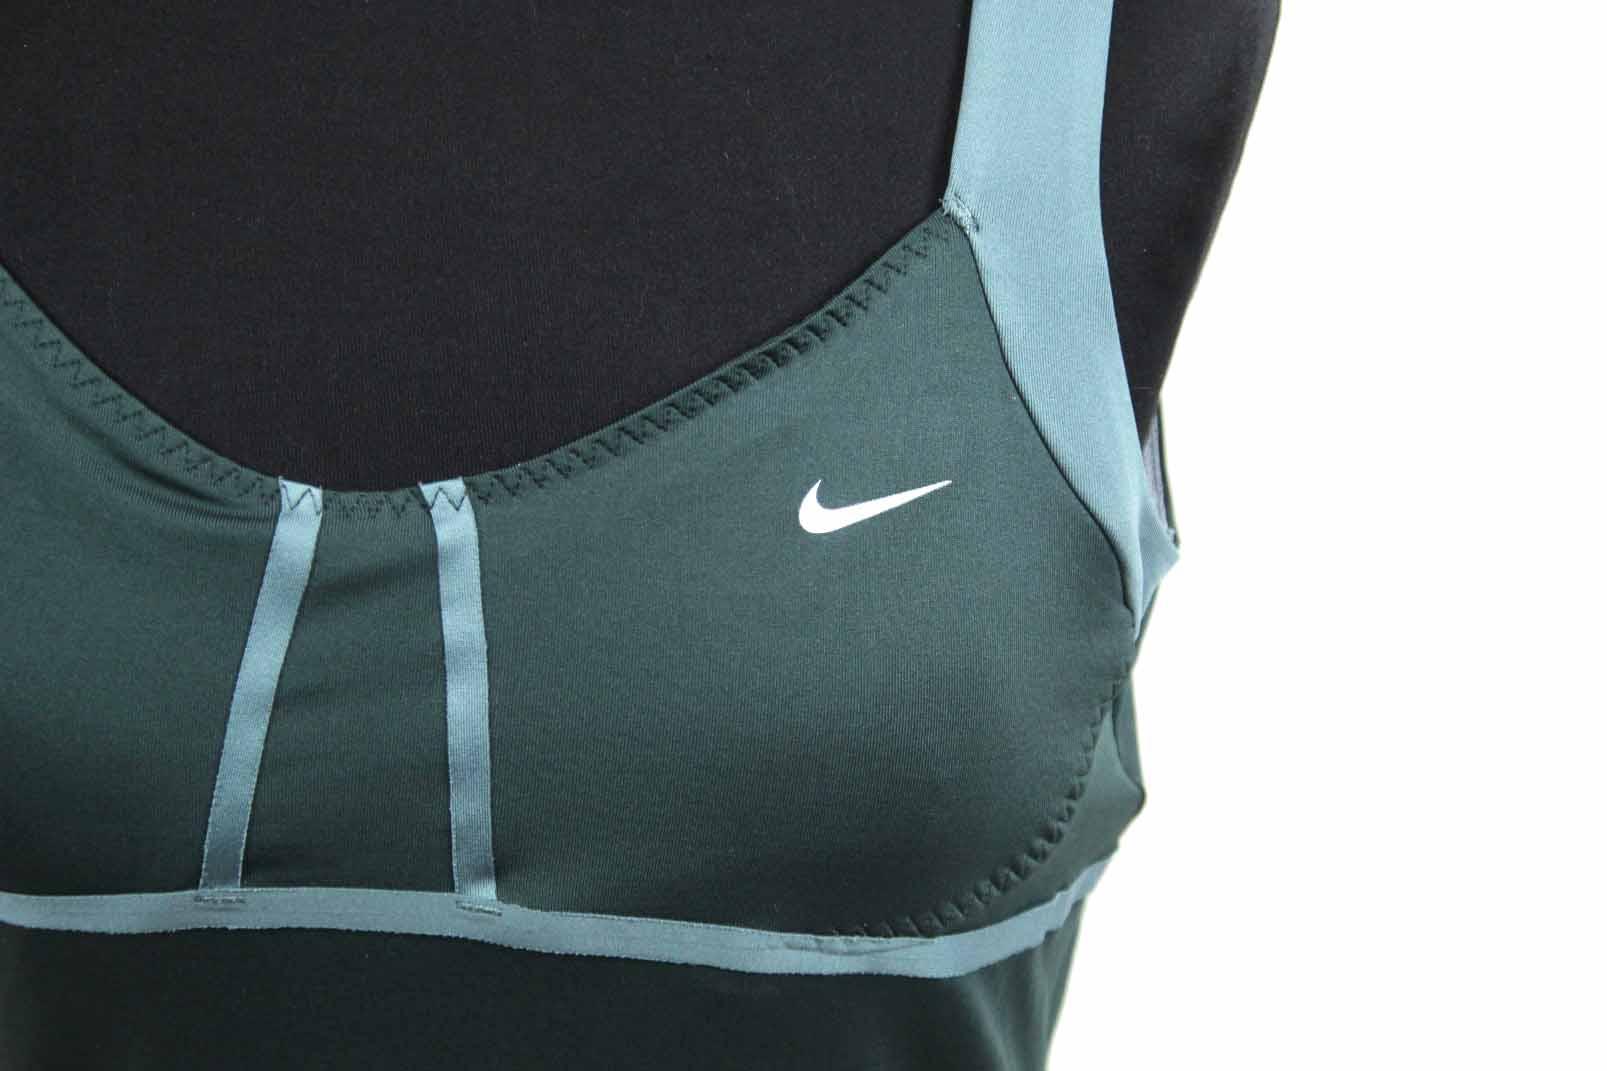 nike dri fit damen sport shirt gr m gr n fitness top bh eingearbeitet ebay. Black Bedroom Furniture Sets. Home Design Ideas